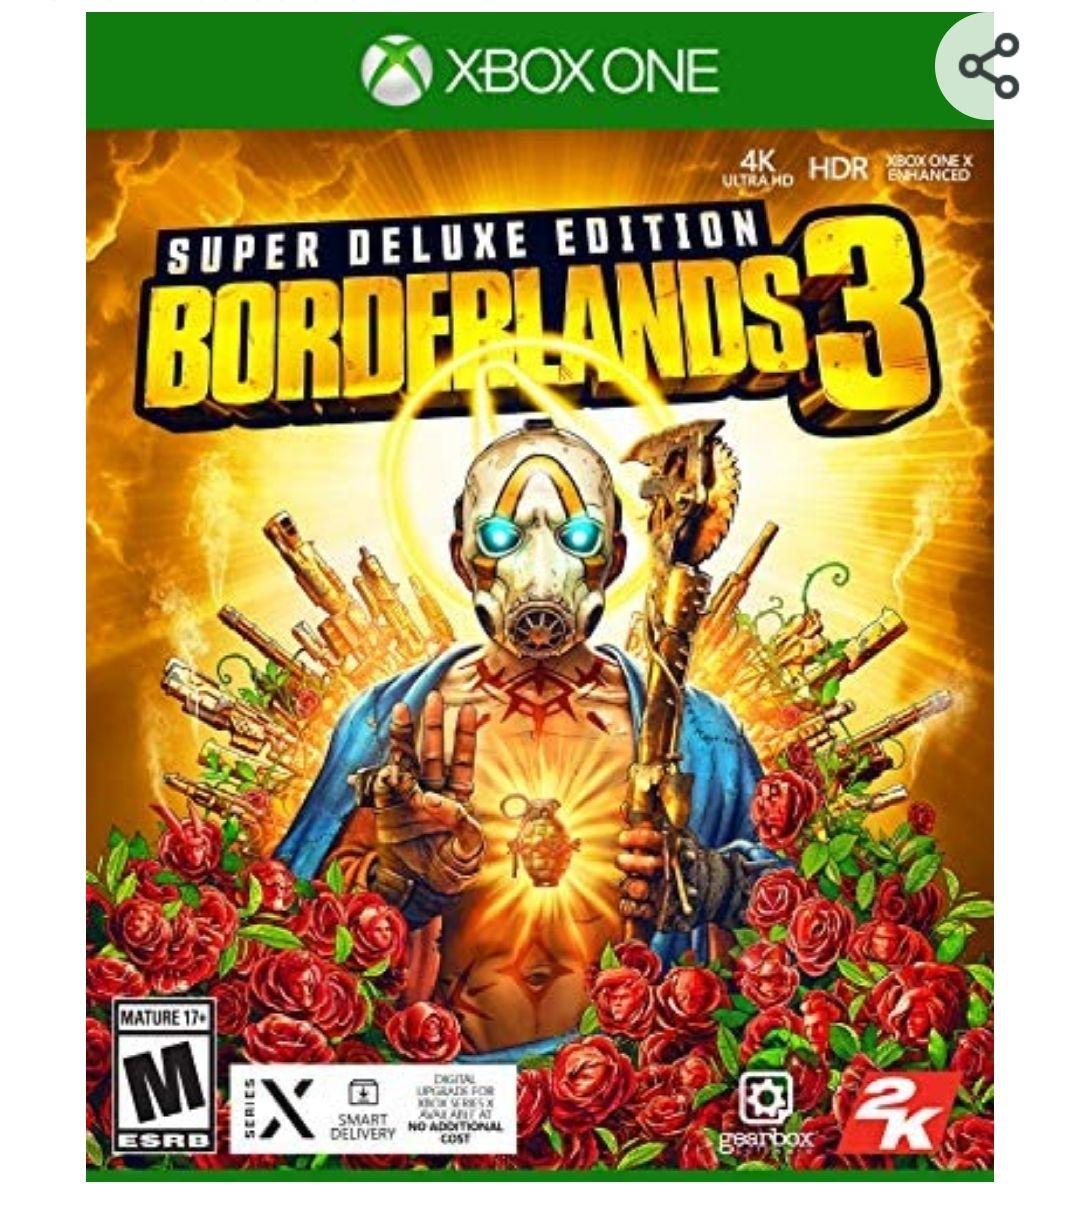 Amazon: Borderlands 3 Super Deluxe Edition Xbox One - Special Edition